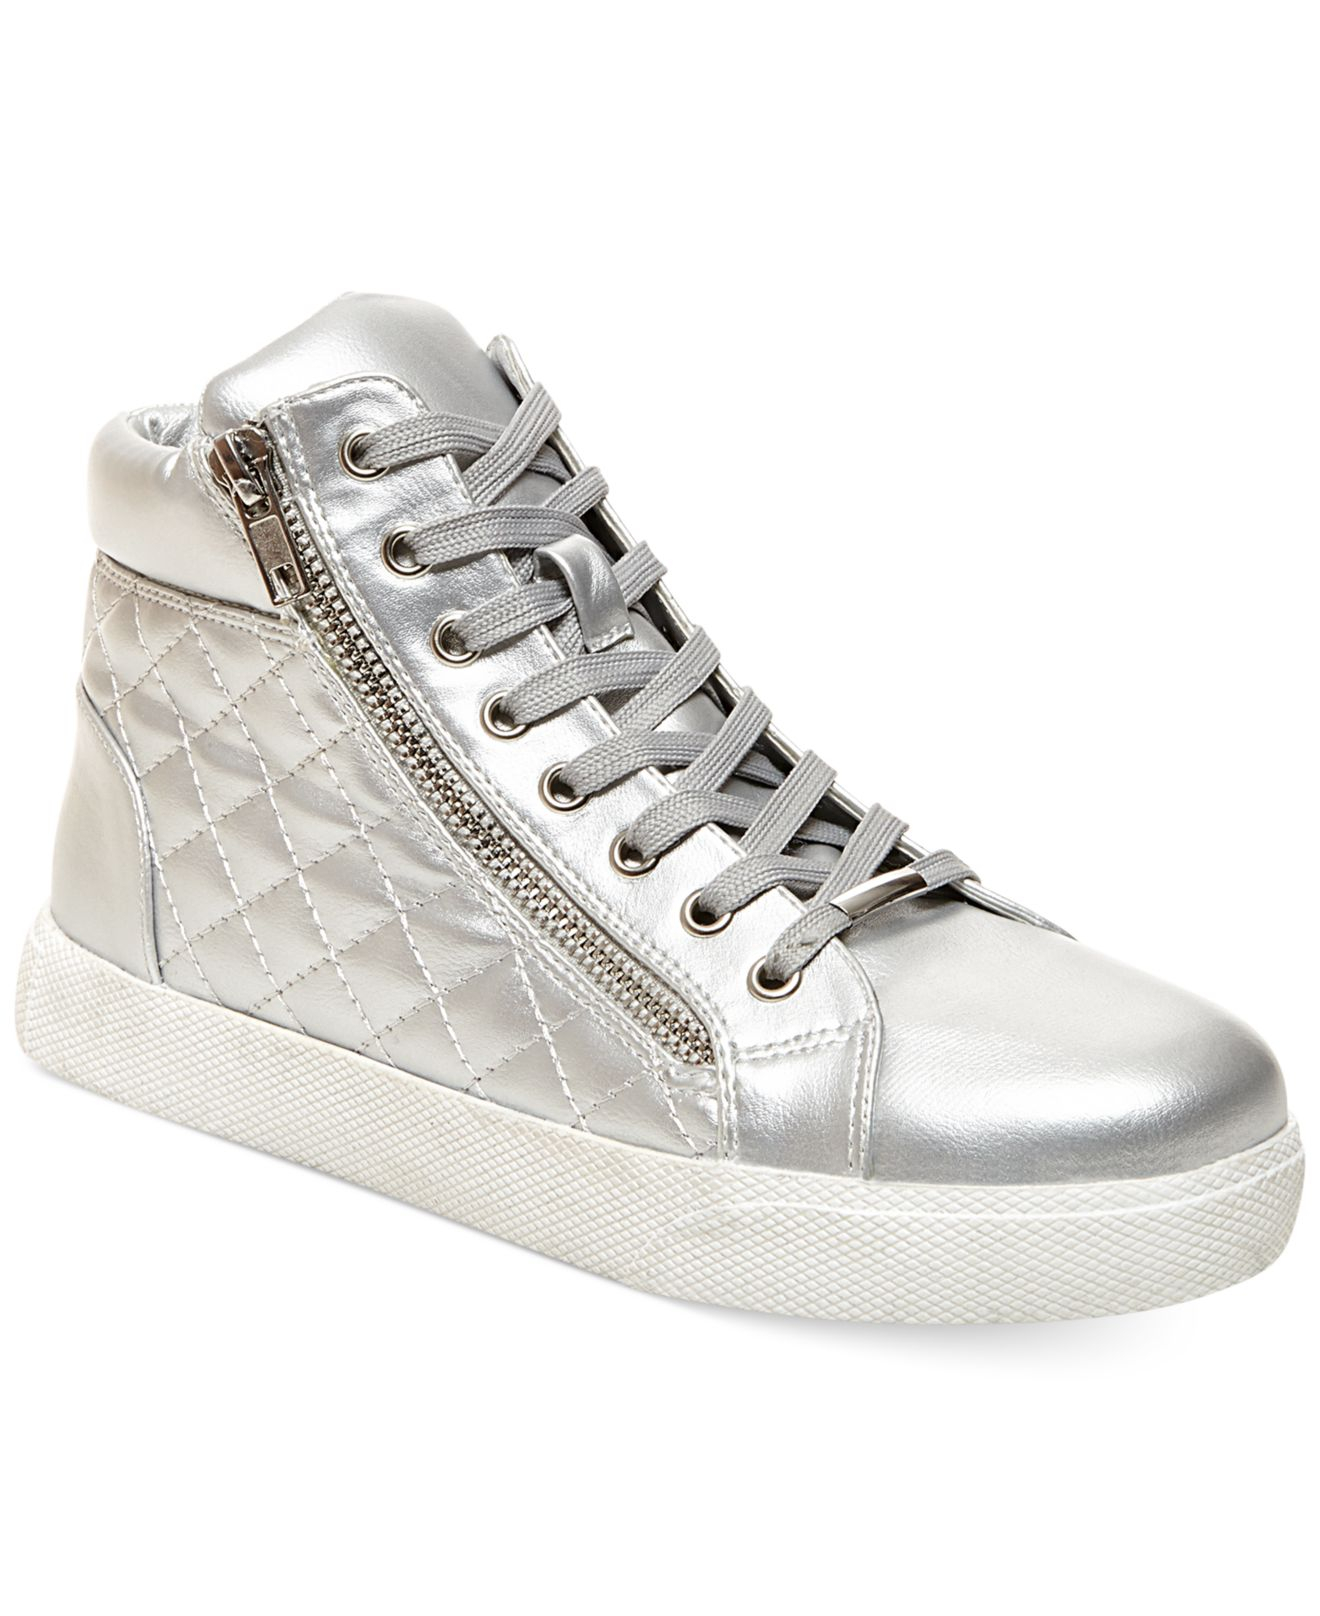 9c9367cb278 Lyst - Steve Madden Decaf Hightop Quilted Platform Sneakers in Metallic